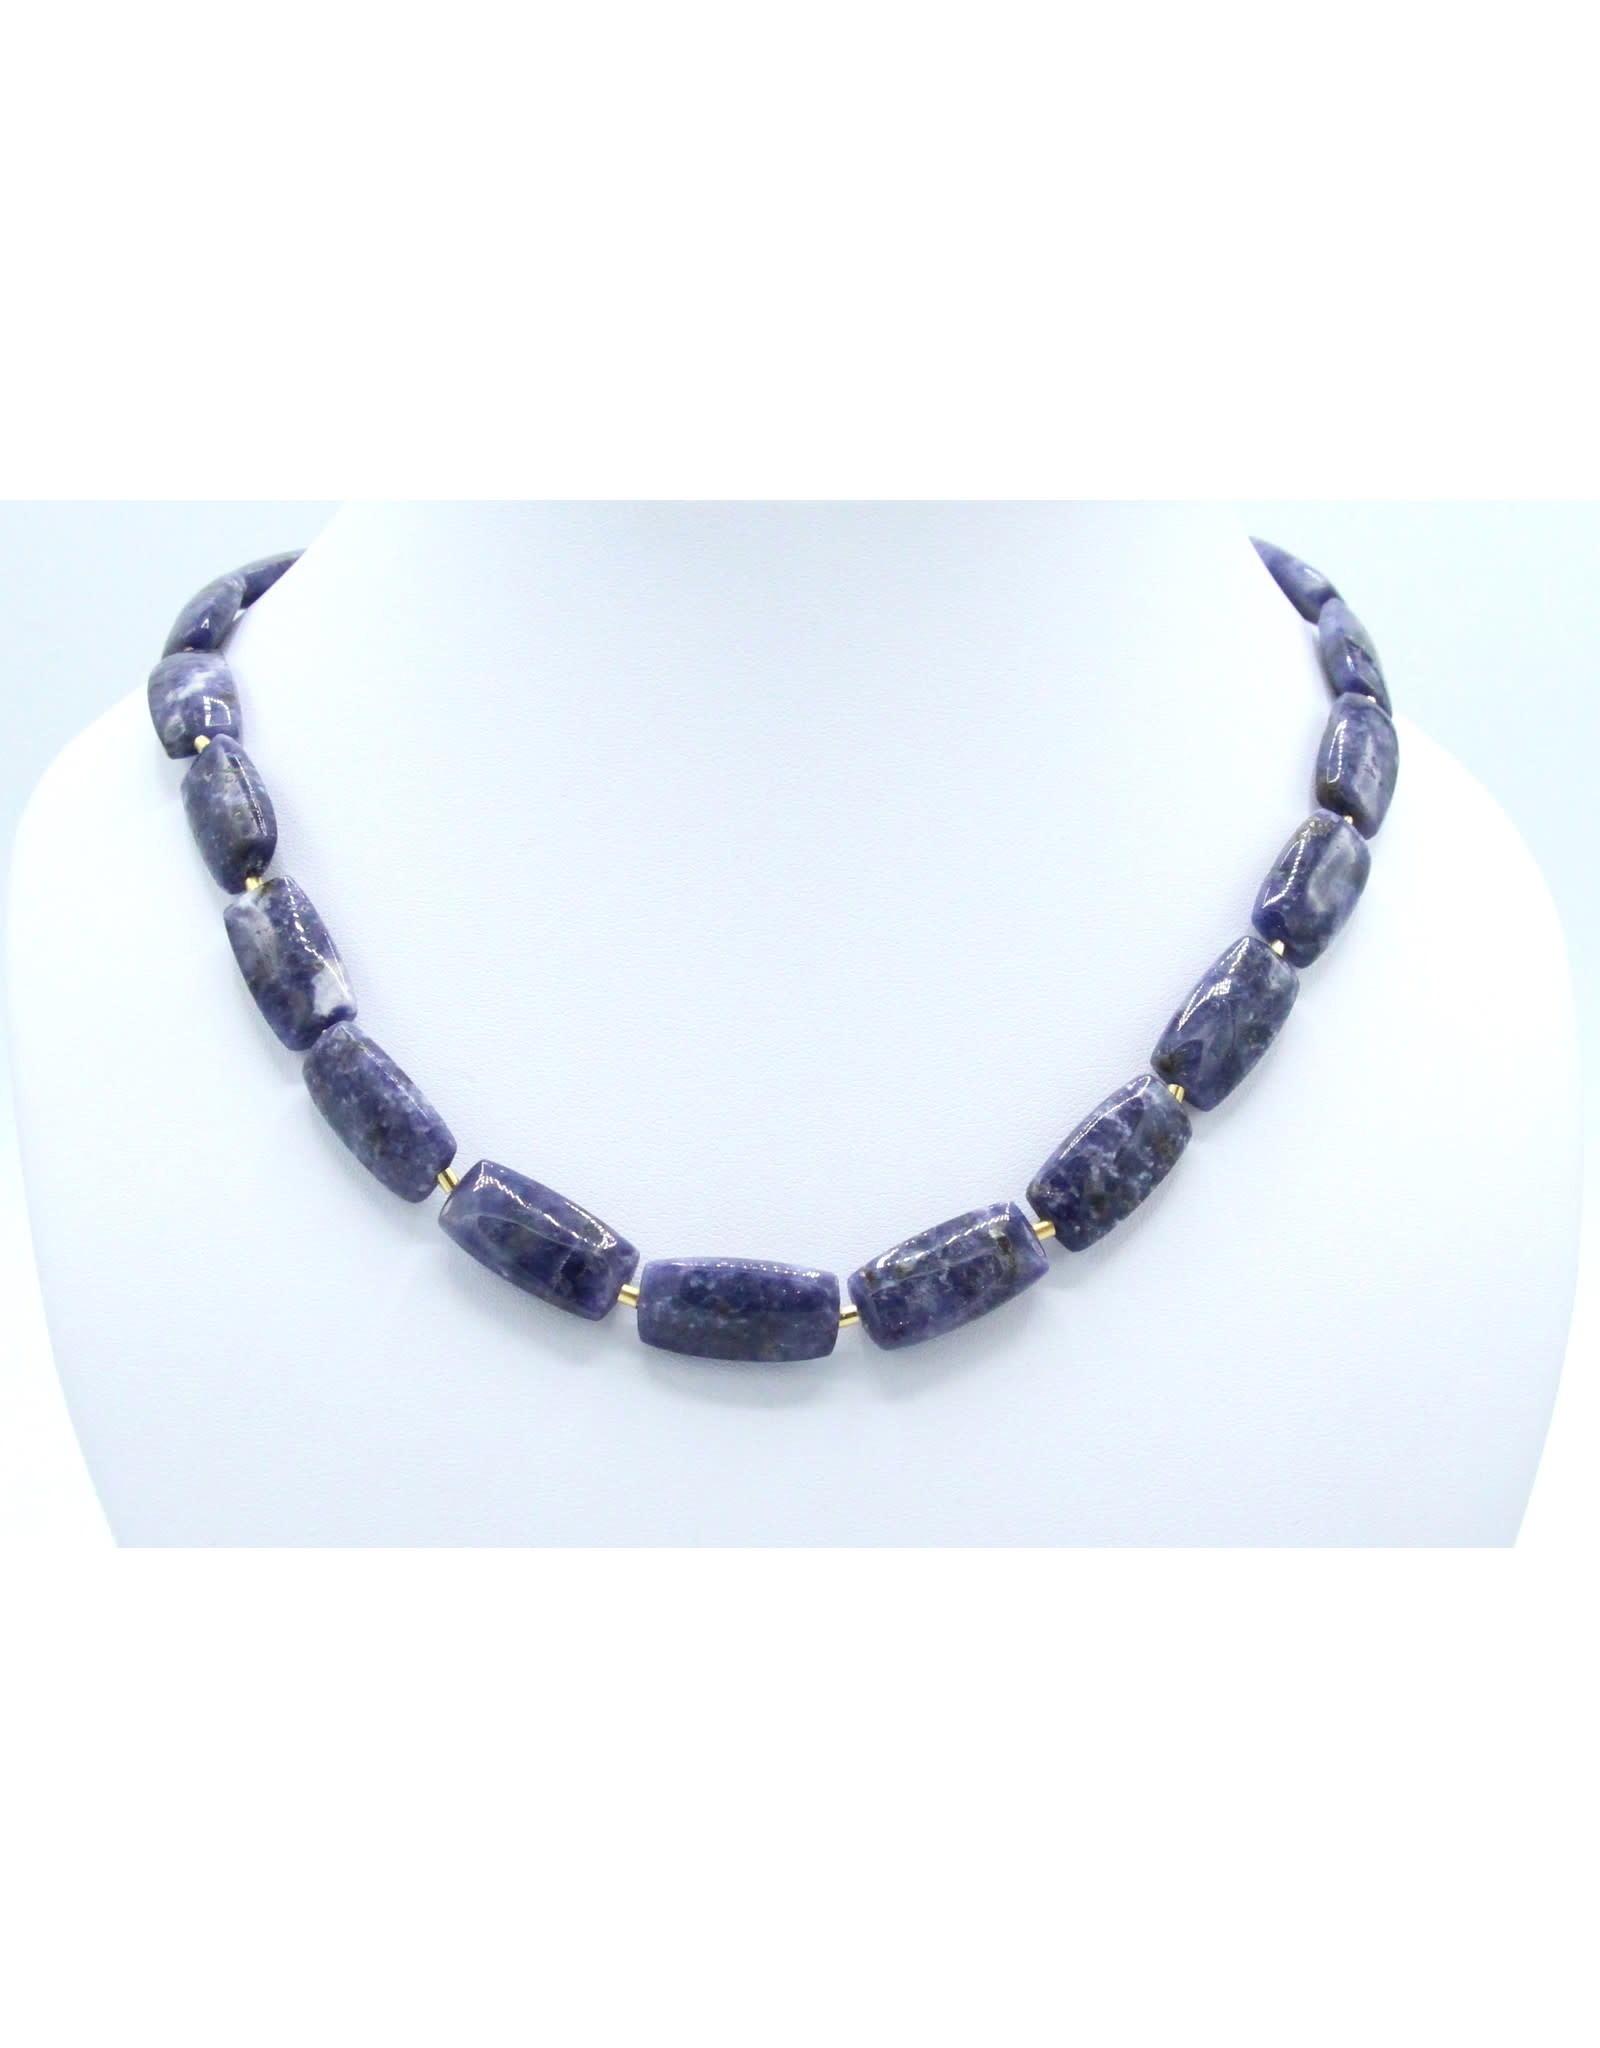 Scapolite Necklace - NSCAP03